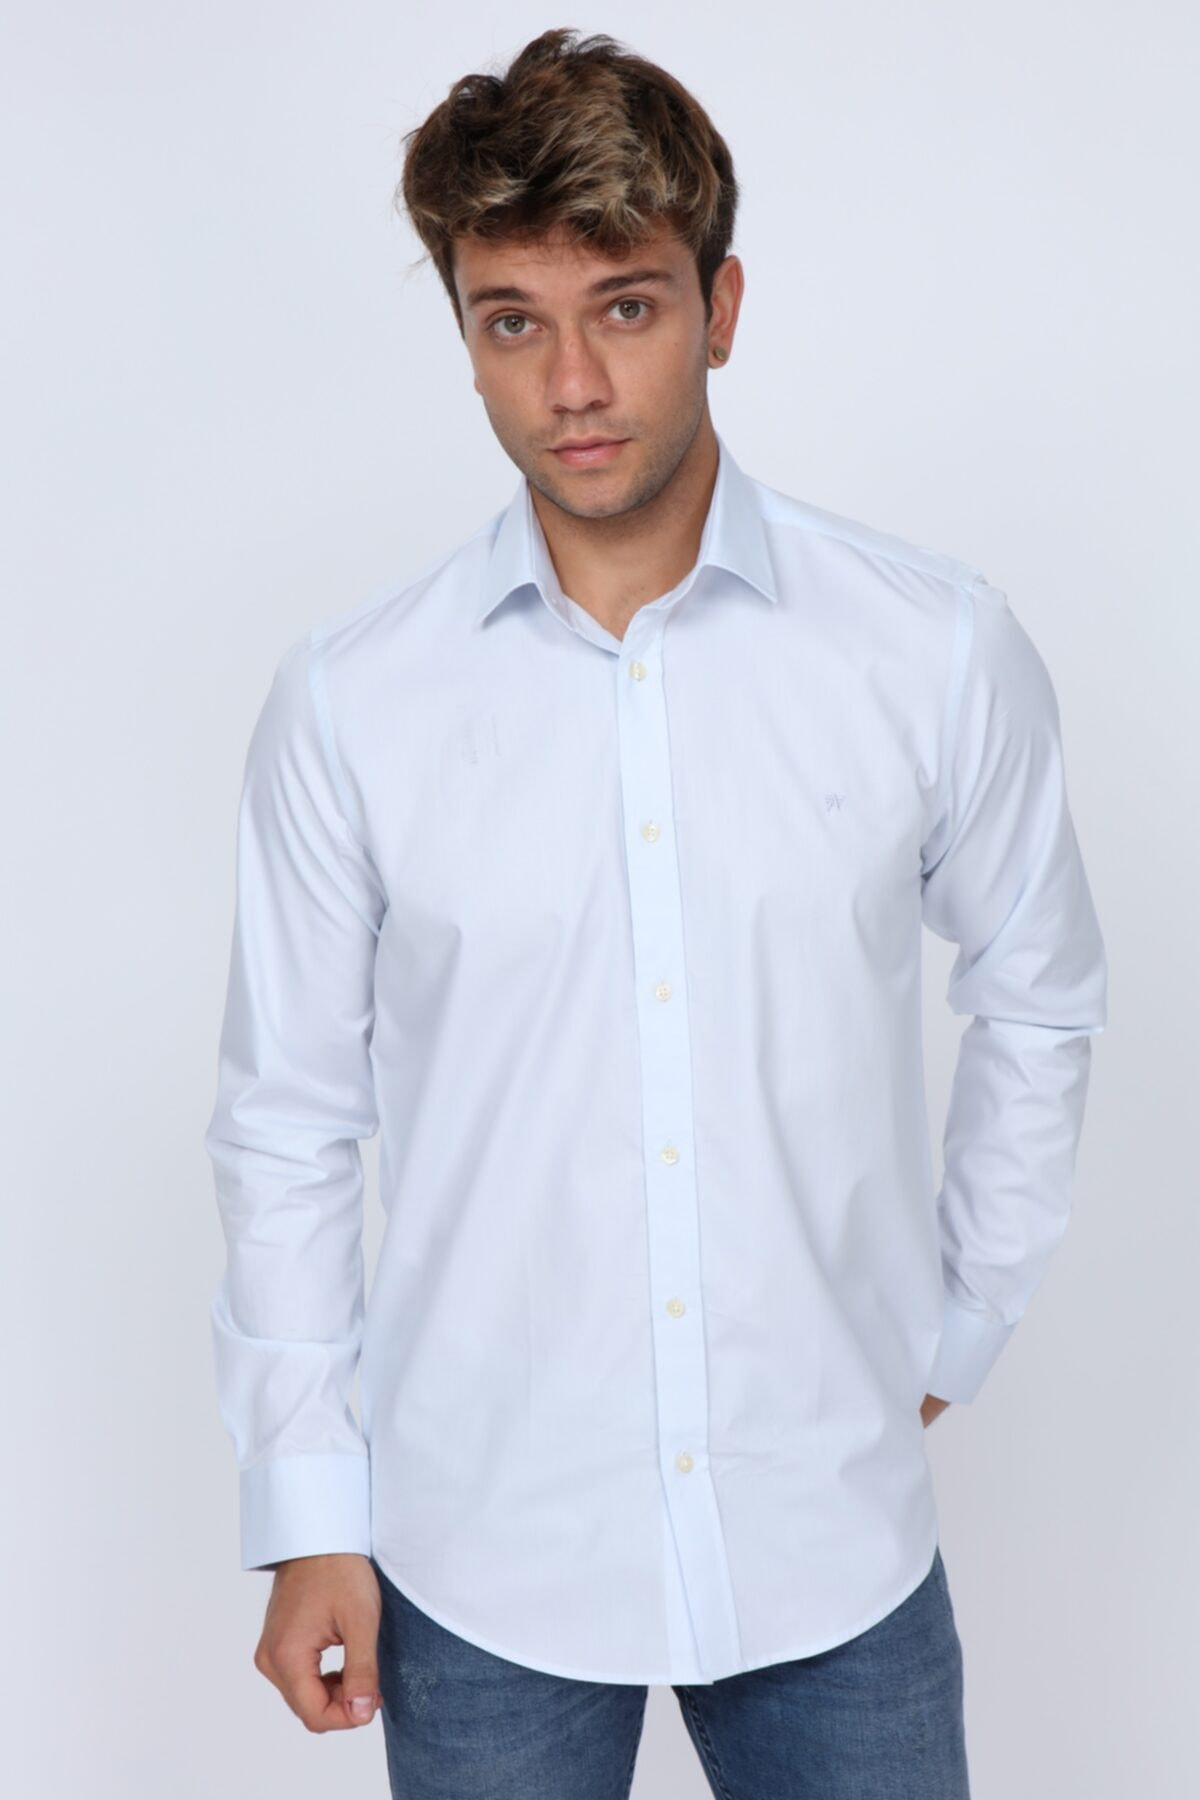 Abbate Slim Fit Buz Mavi Erkek Gömlek (mikro Kumaş Detay) 1